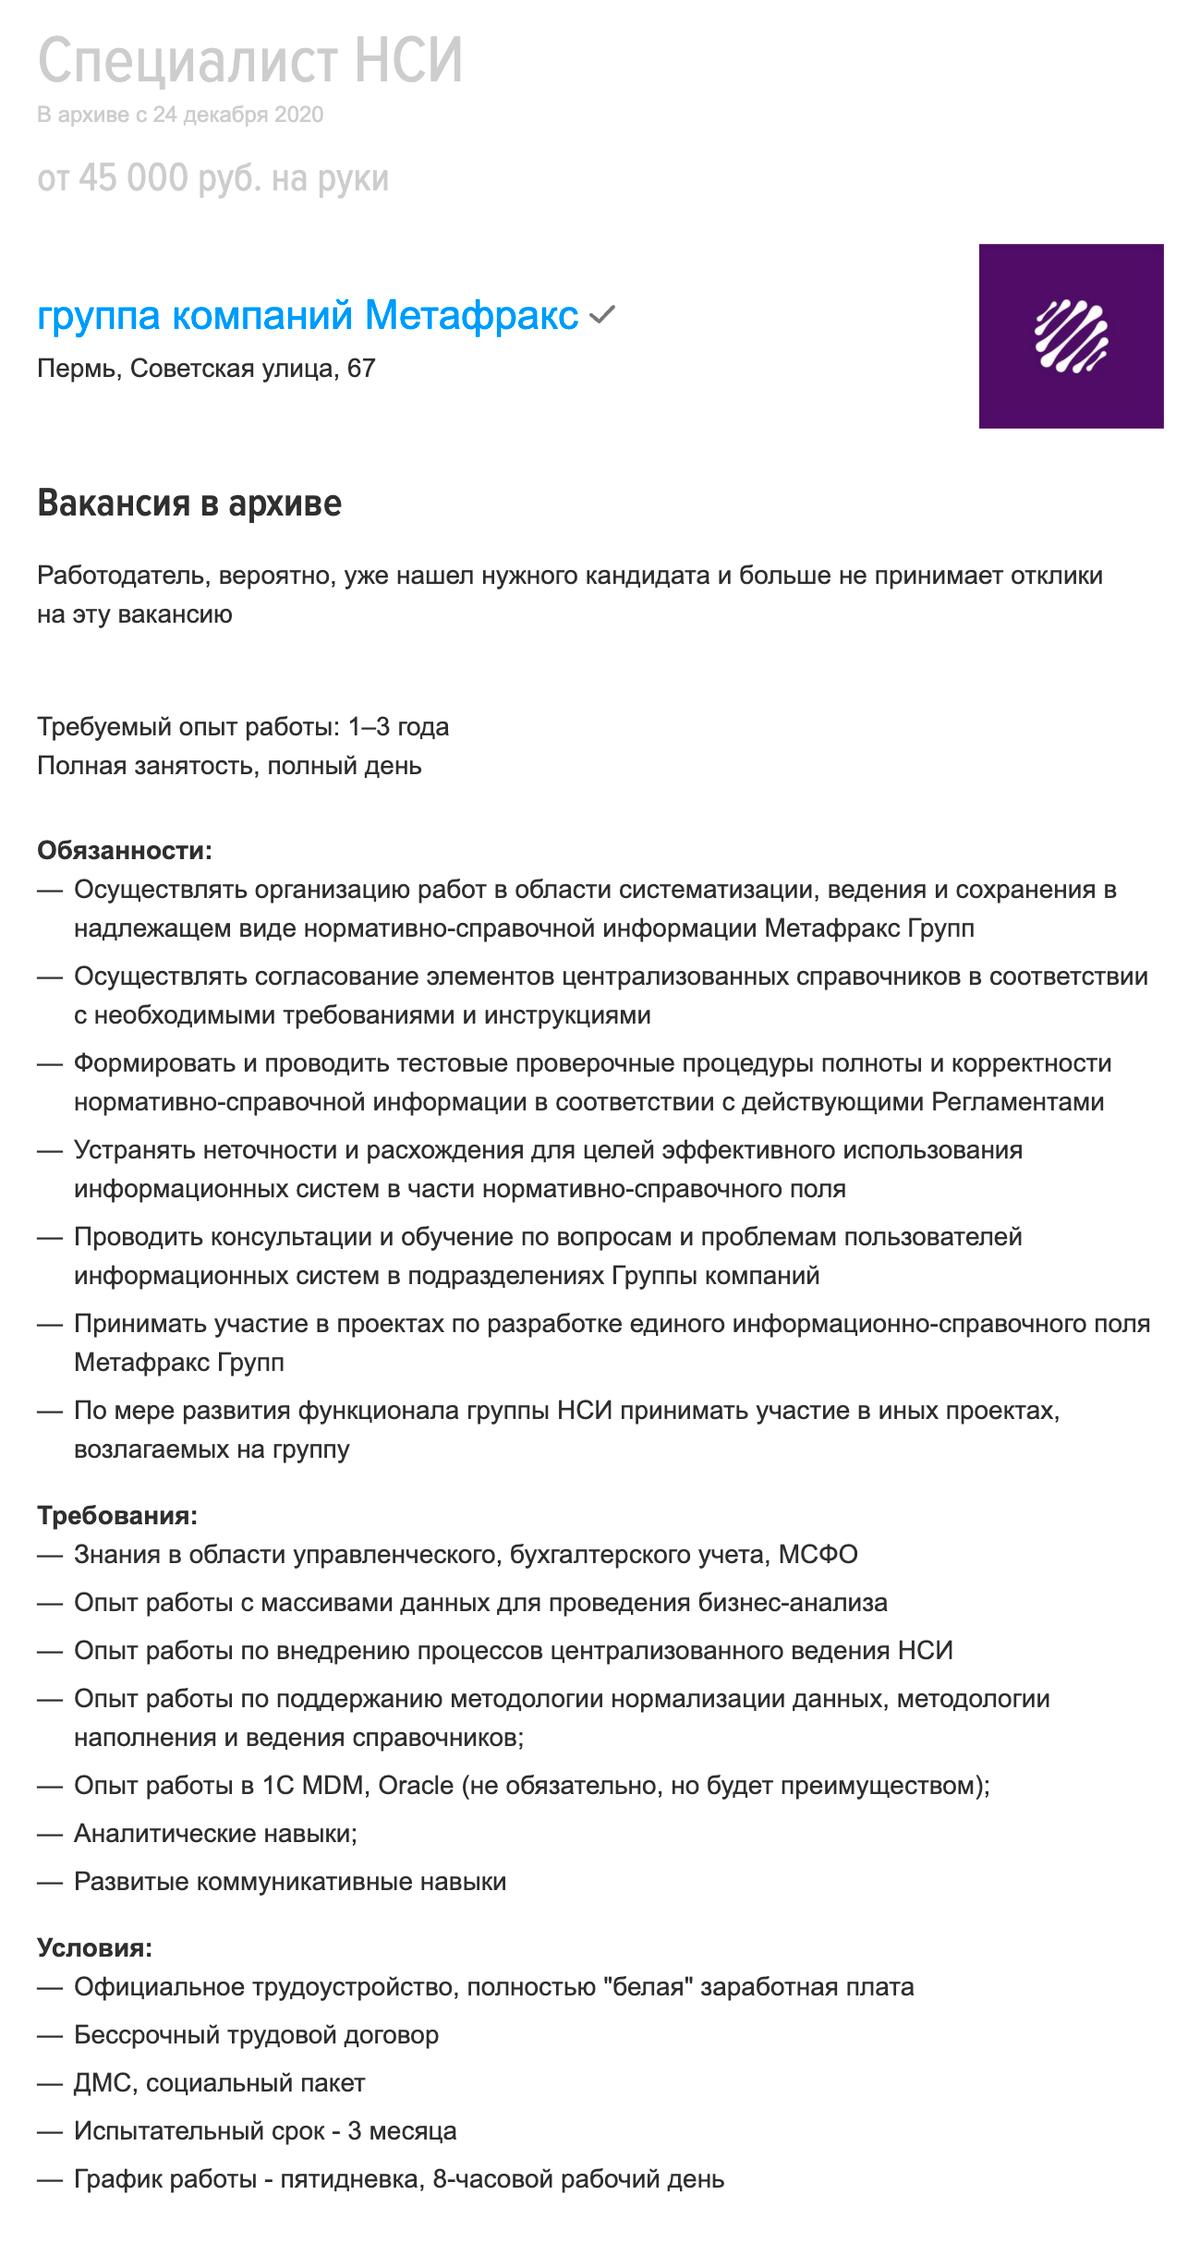 Вакансия линейного специалиста в «Метафраксе». Зарплата на предприятии примерно соответствует среднестатистической по отрасли — 61 900<span class=ruble>Р</span>